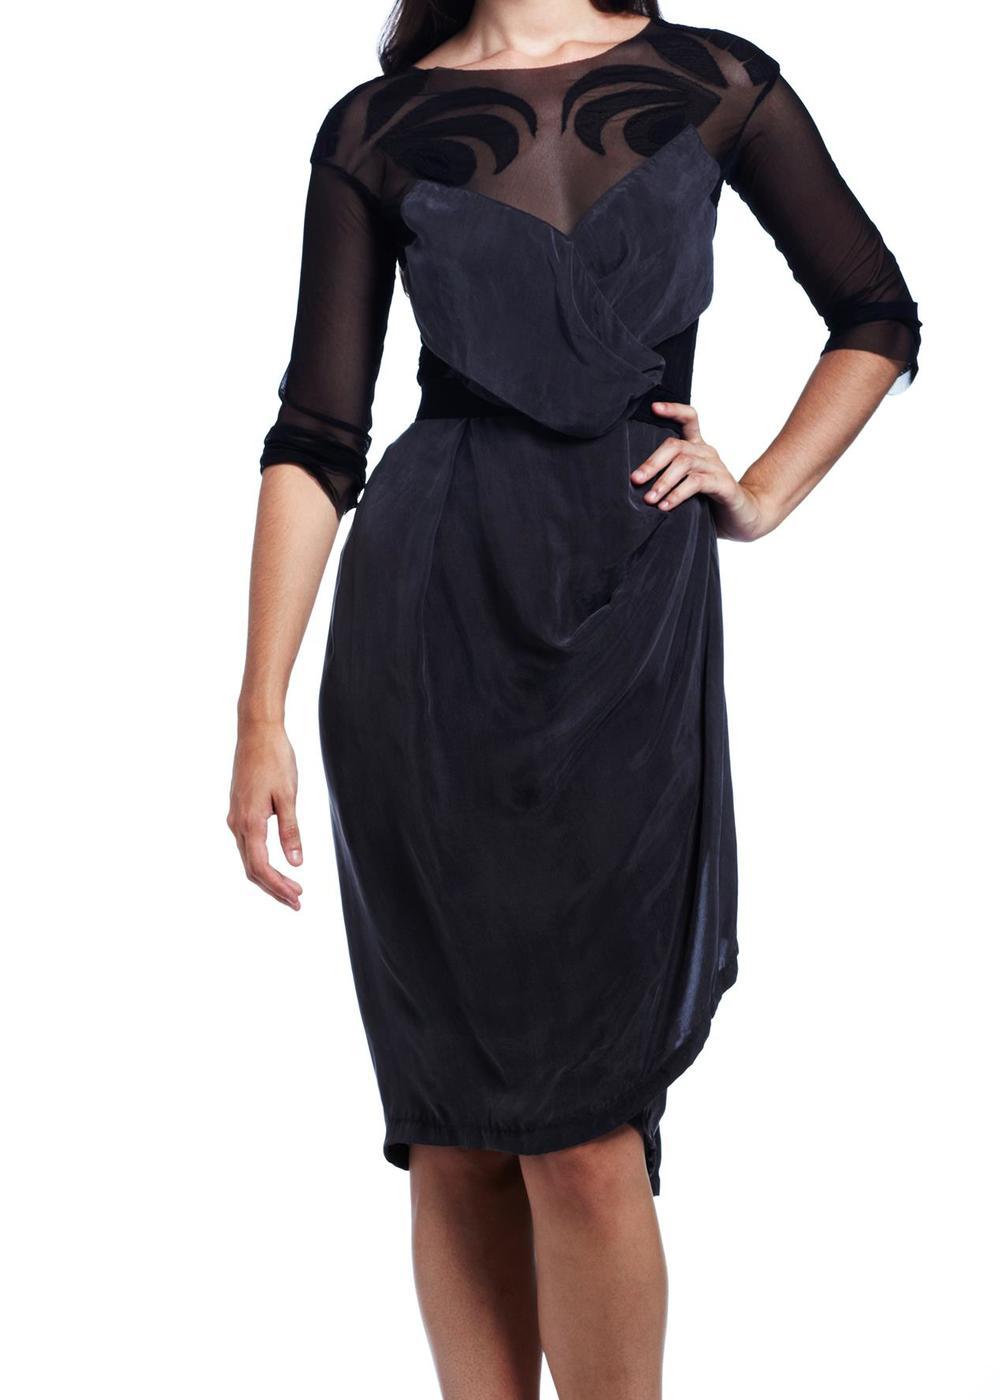 Soul Lonika Dress / DANIEL SILVERSTEIN, $450 @kaightshop.com